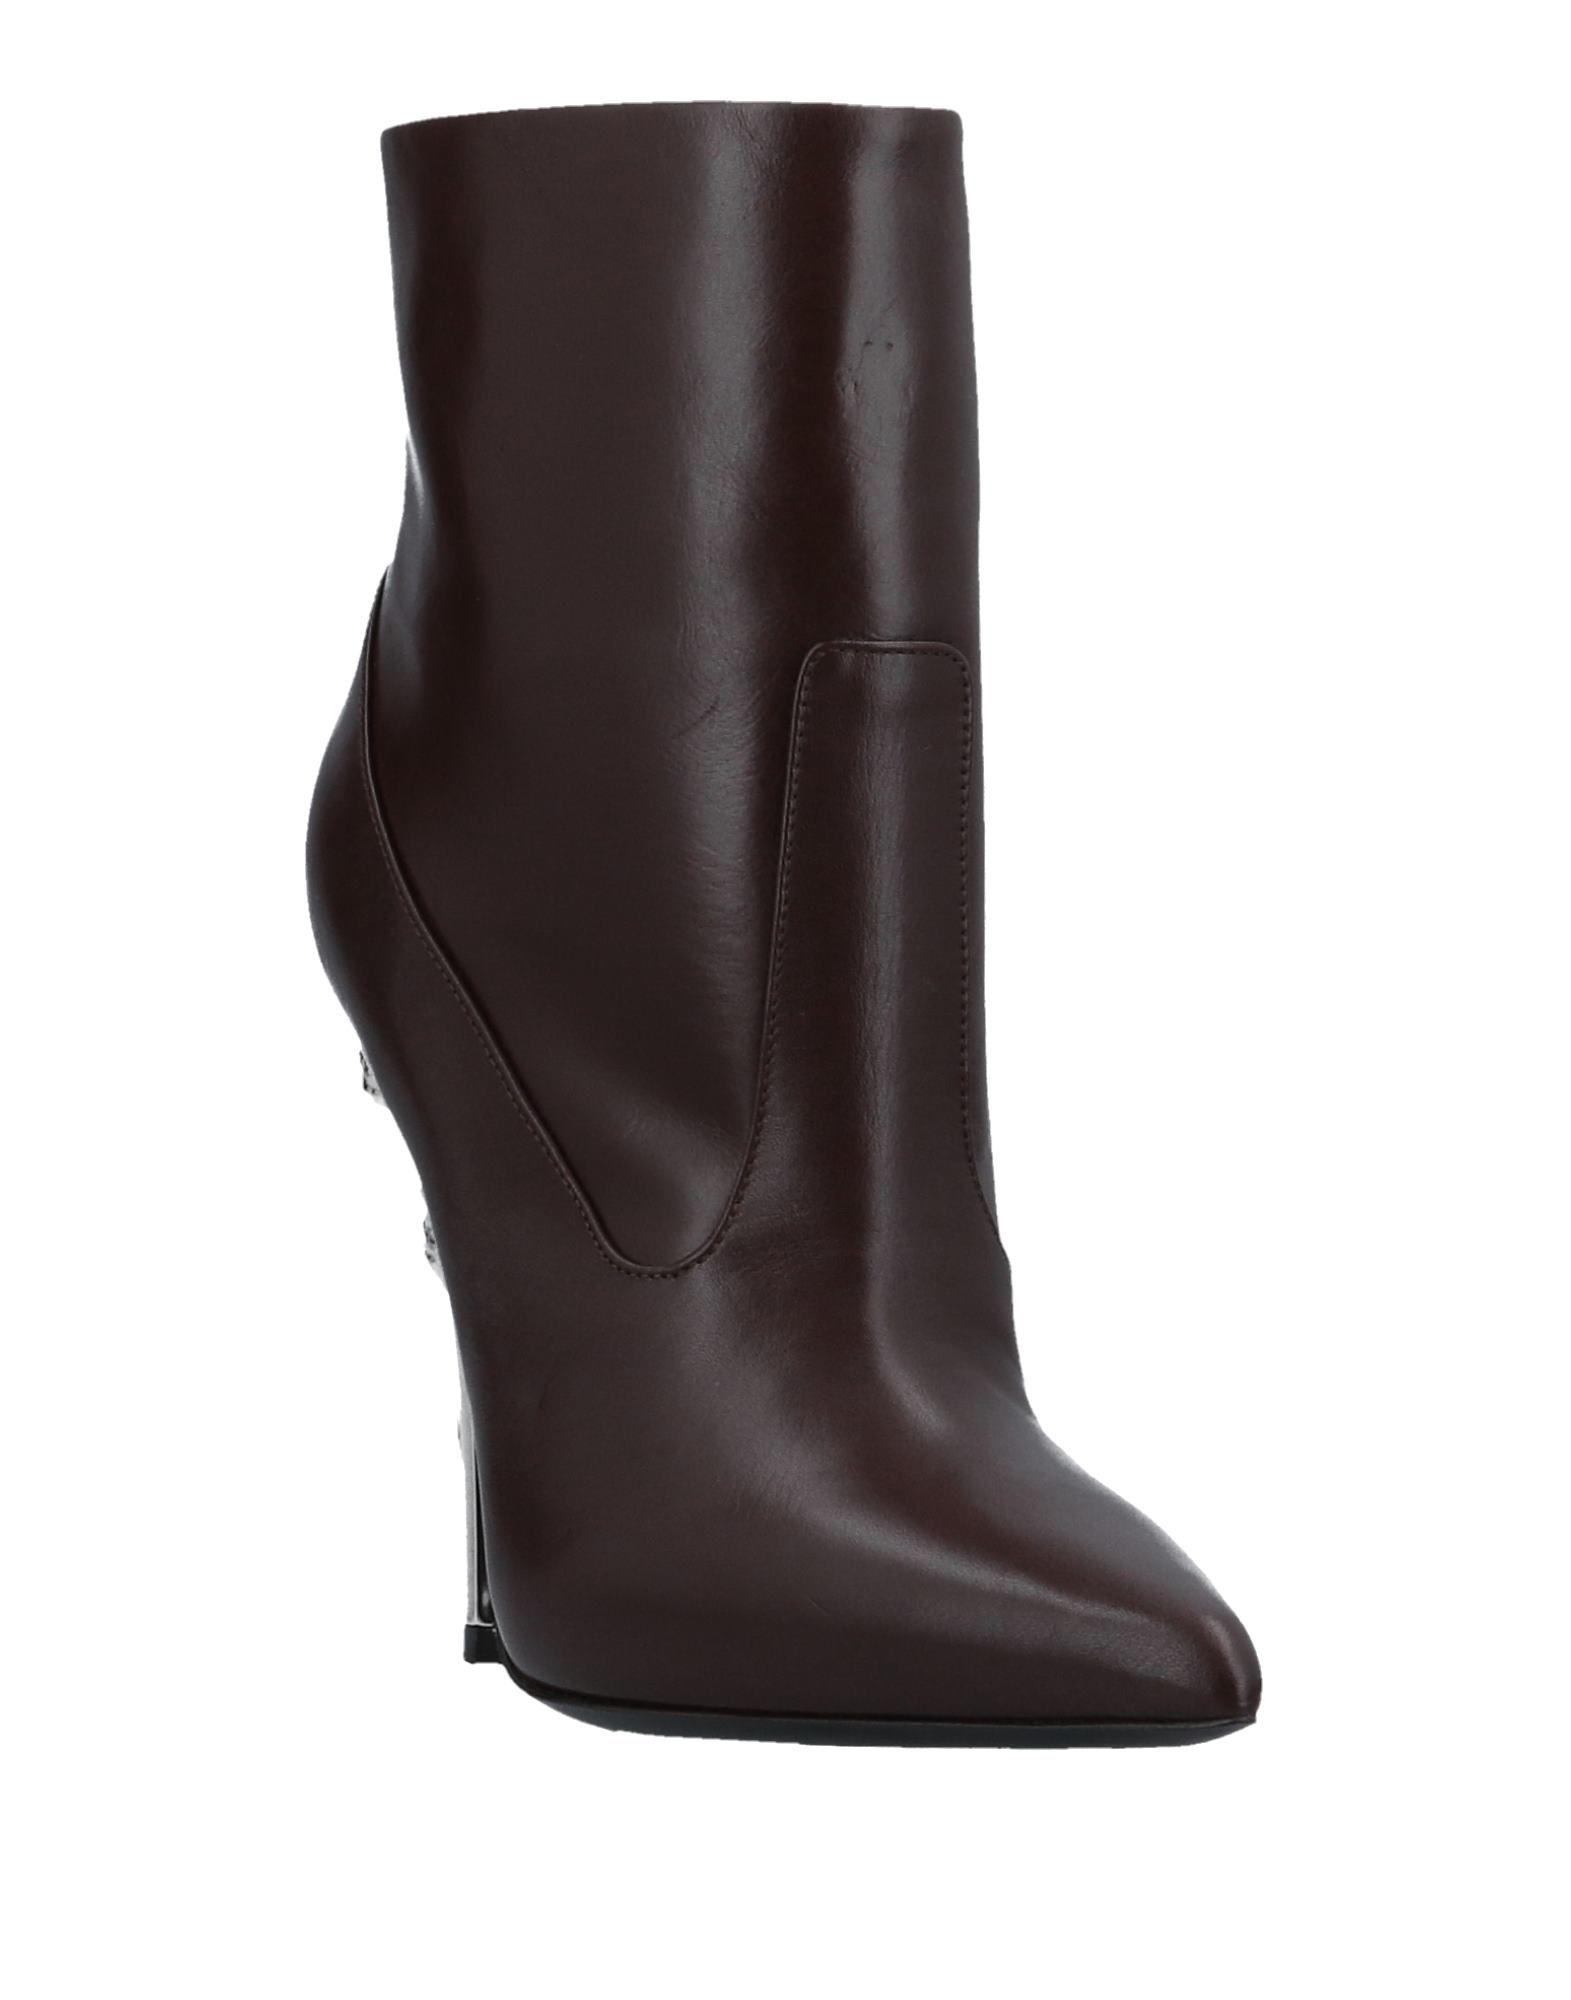 Versus Versace  Stiefelette Damen  Versace 11509455BQ Beliebte Schuhe 303b91